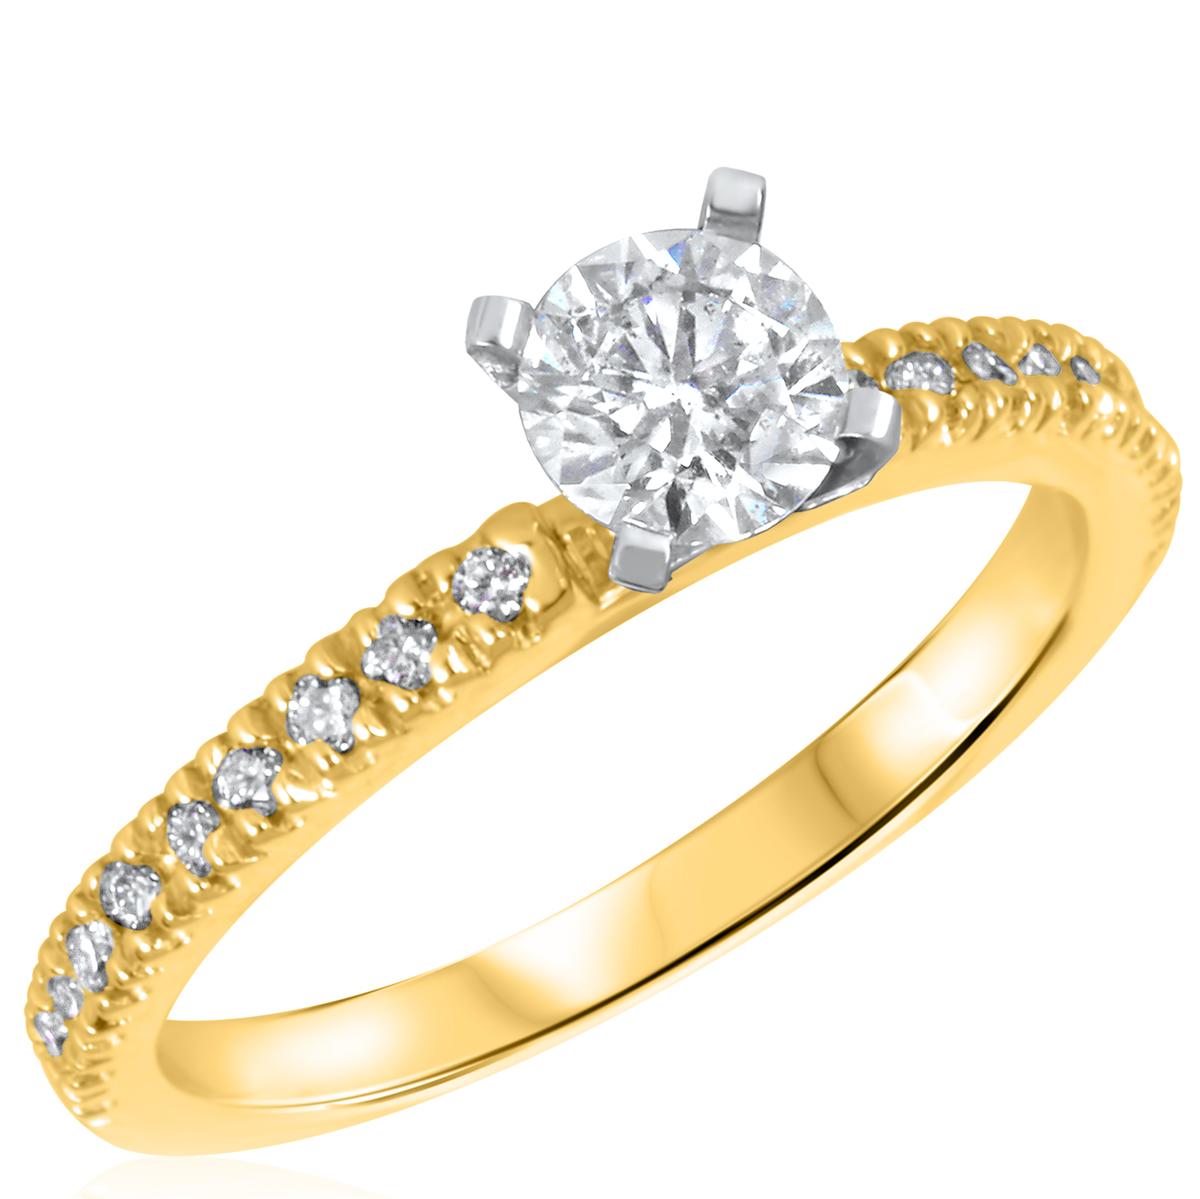 3/4 CT. T.W. Diamond Ladies Engagement Ring 10K Yellow Gold- Size 8